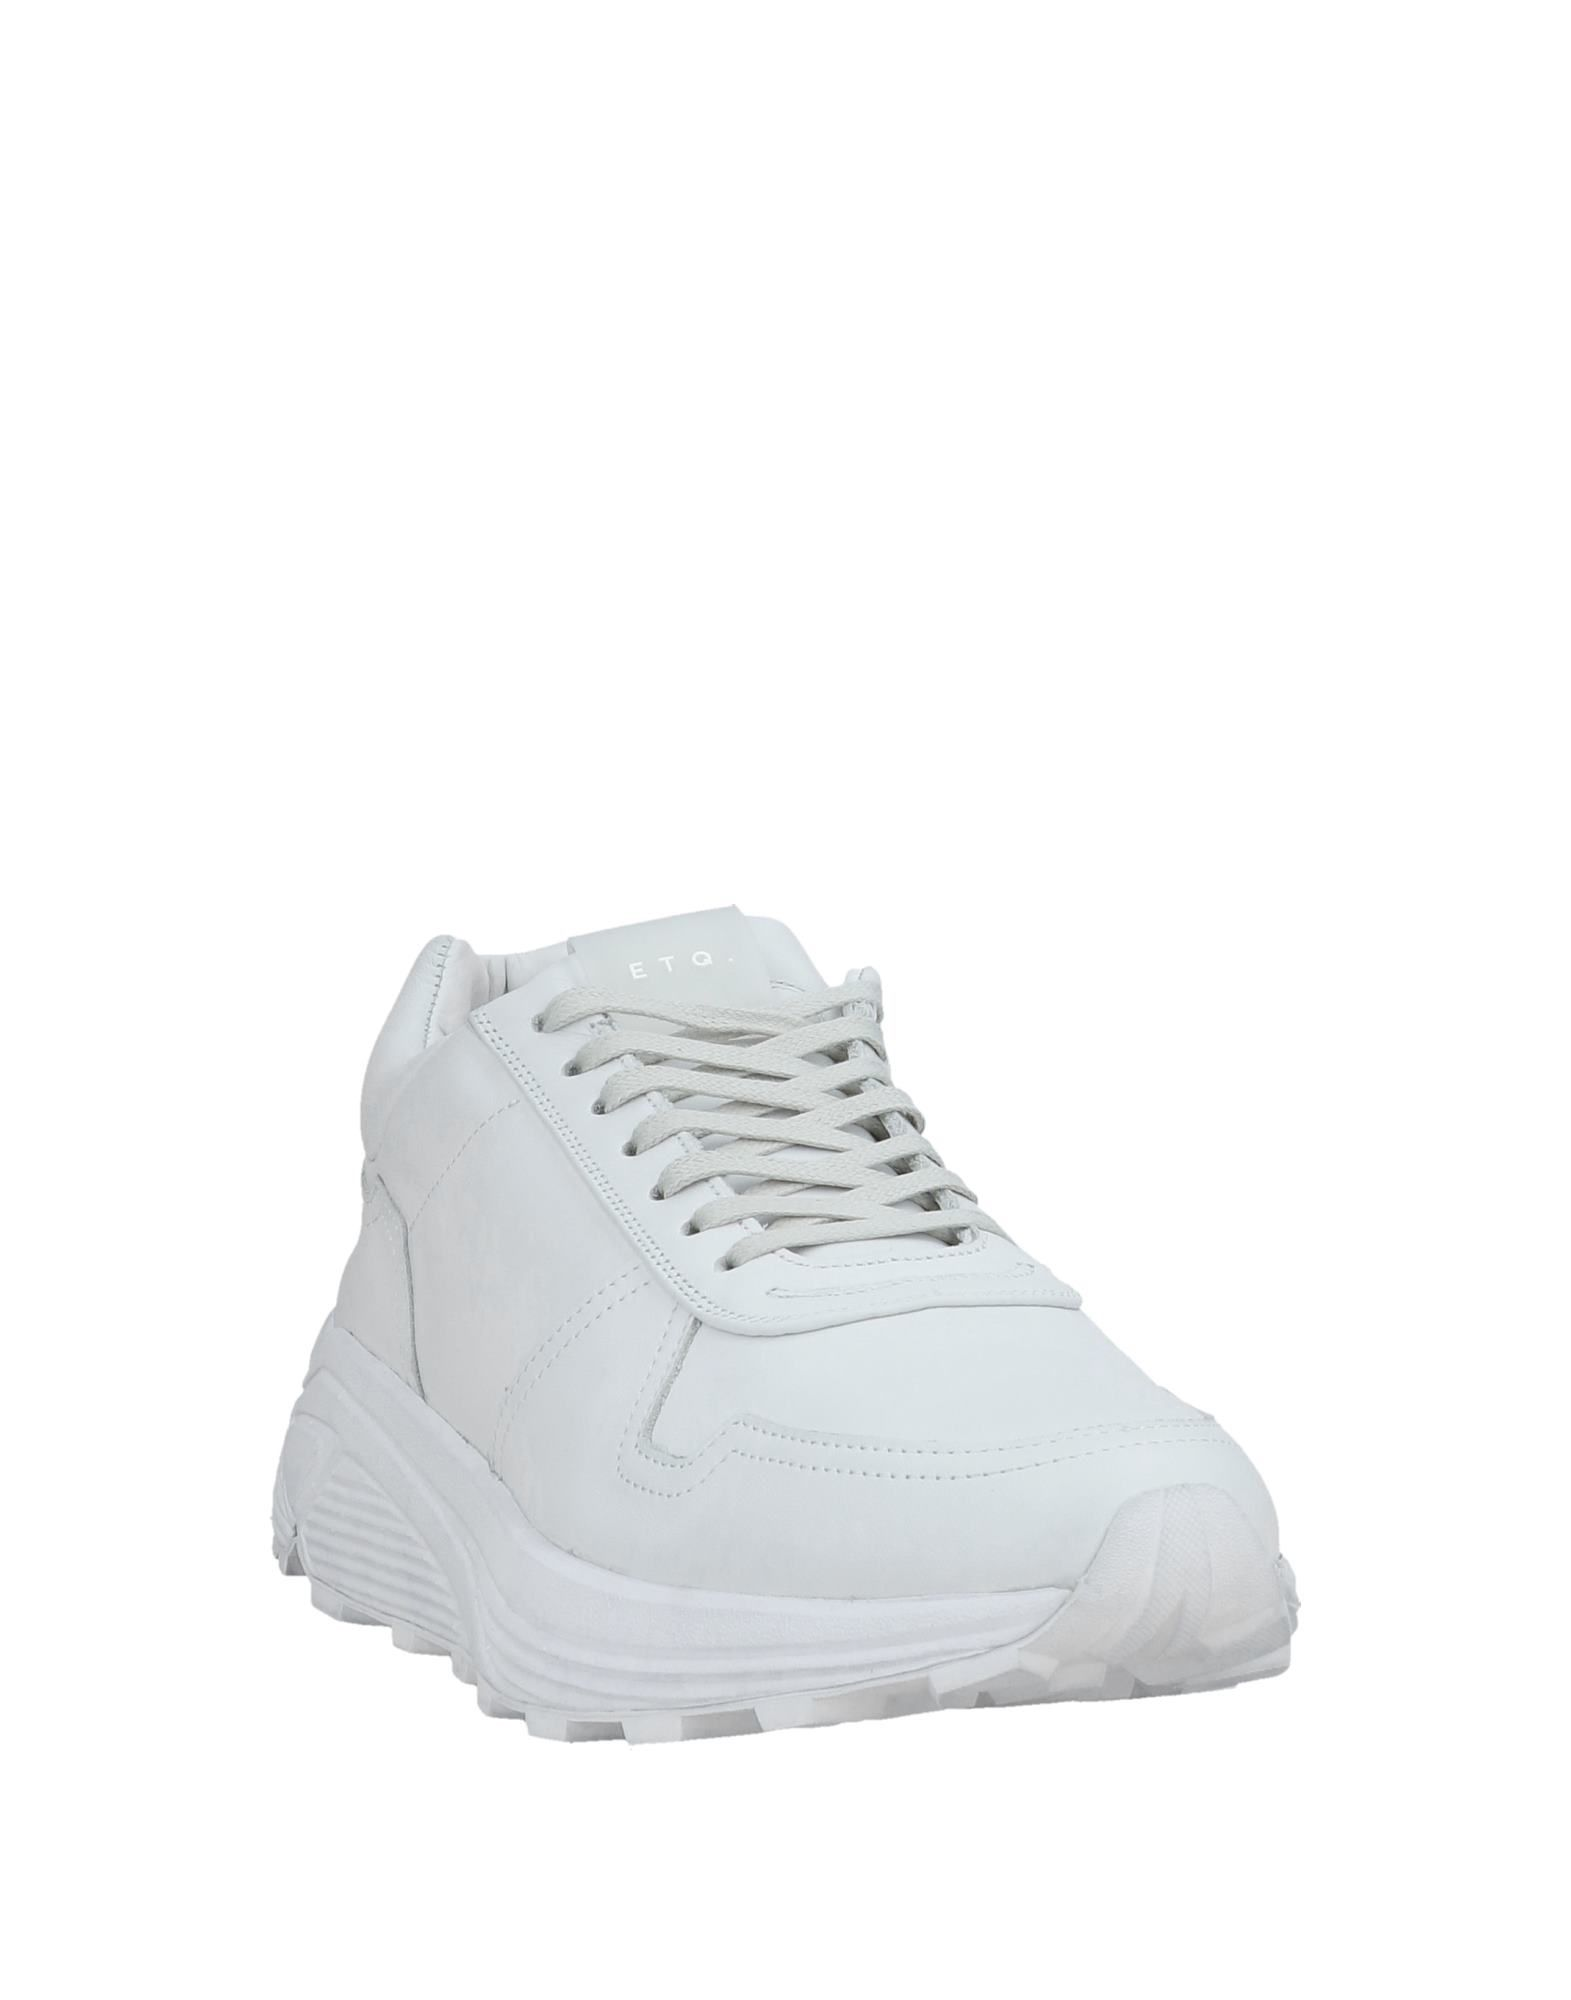 Sneakers Etq Uomo Amsterdam Uomo Etq - 11563271CF 2cd80e